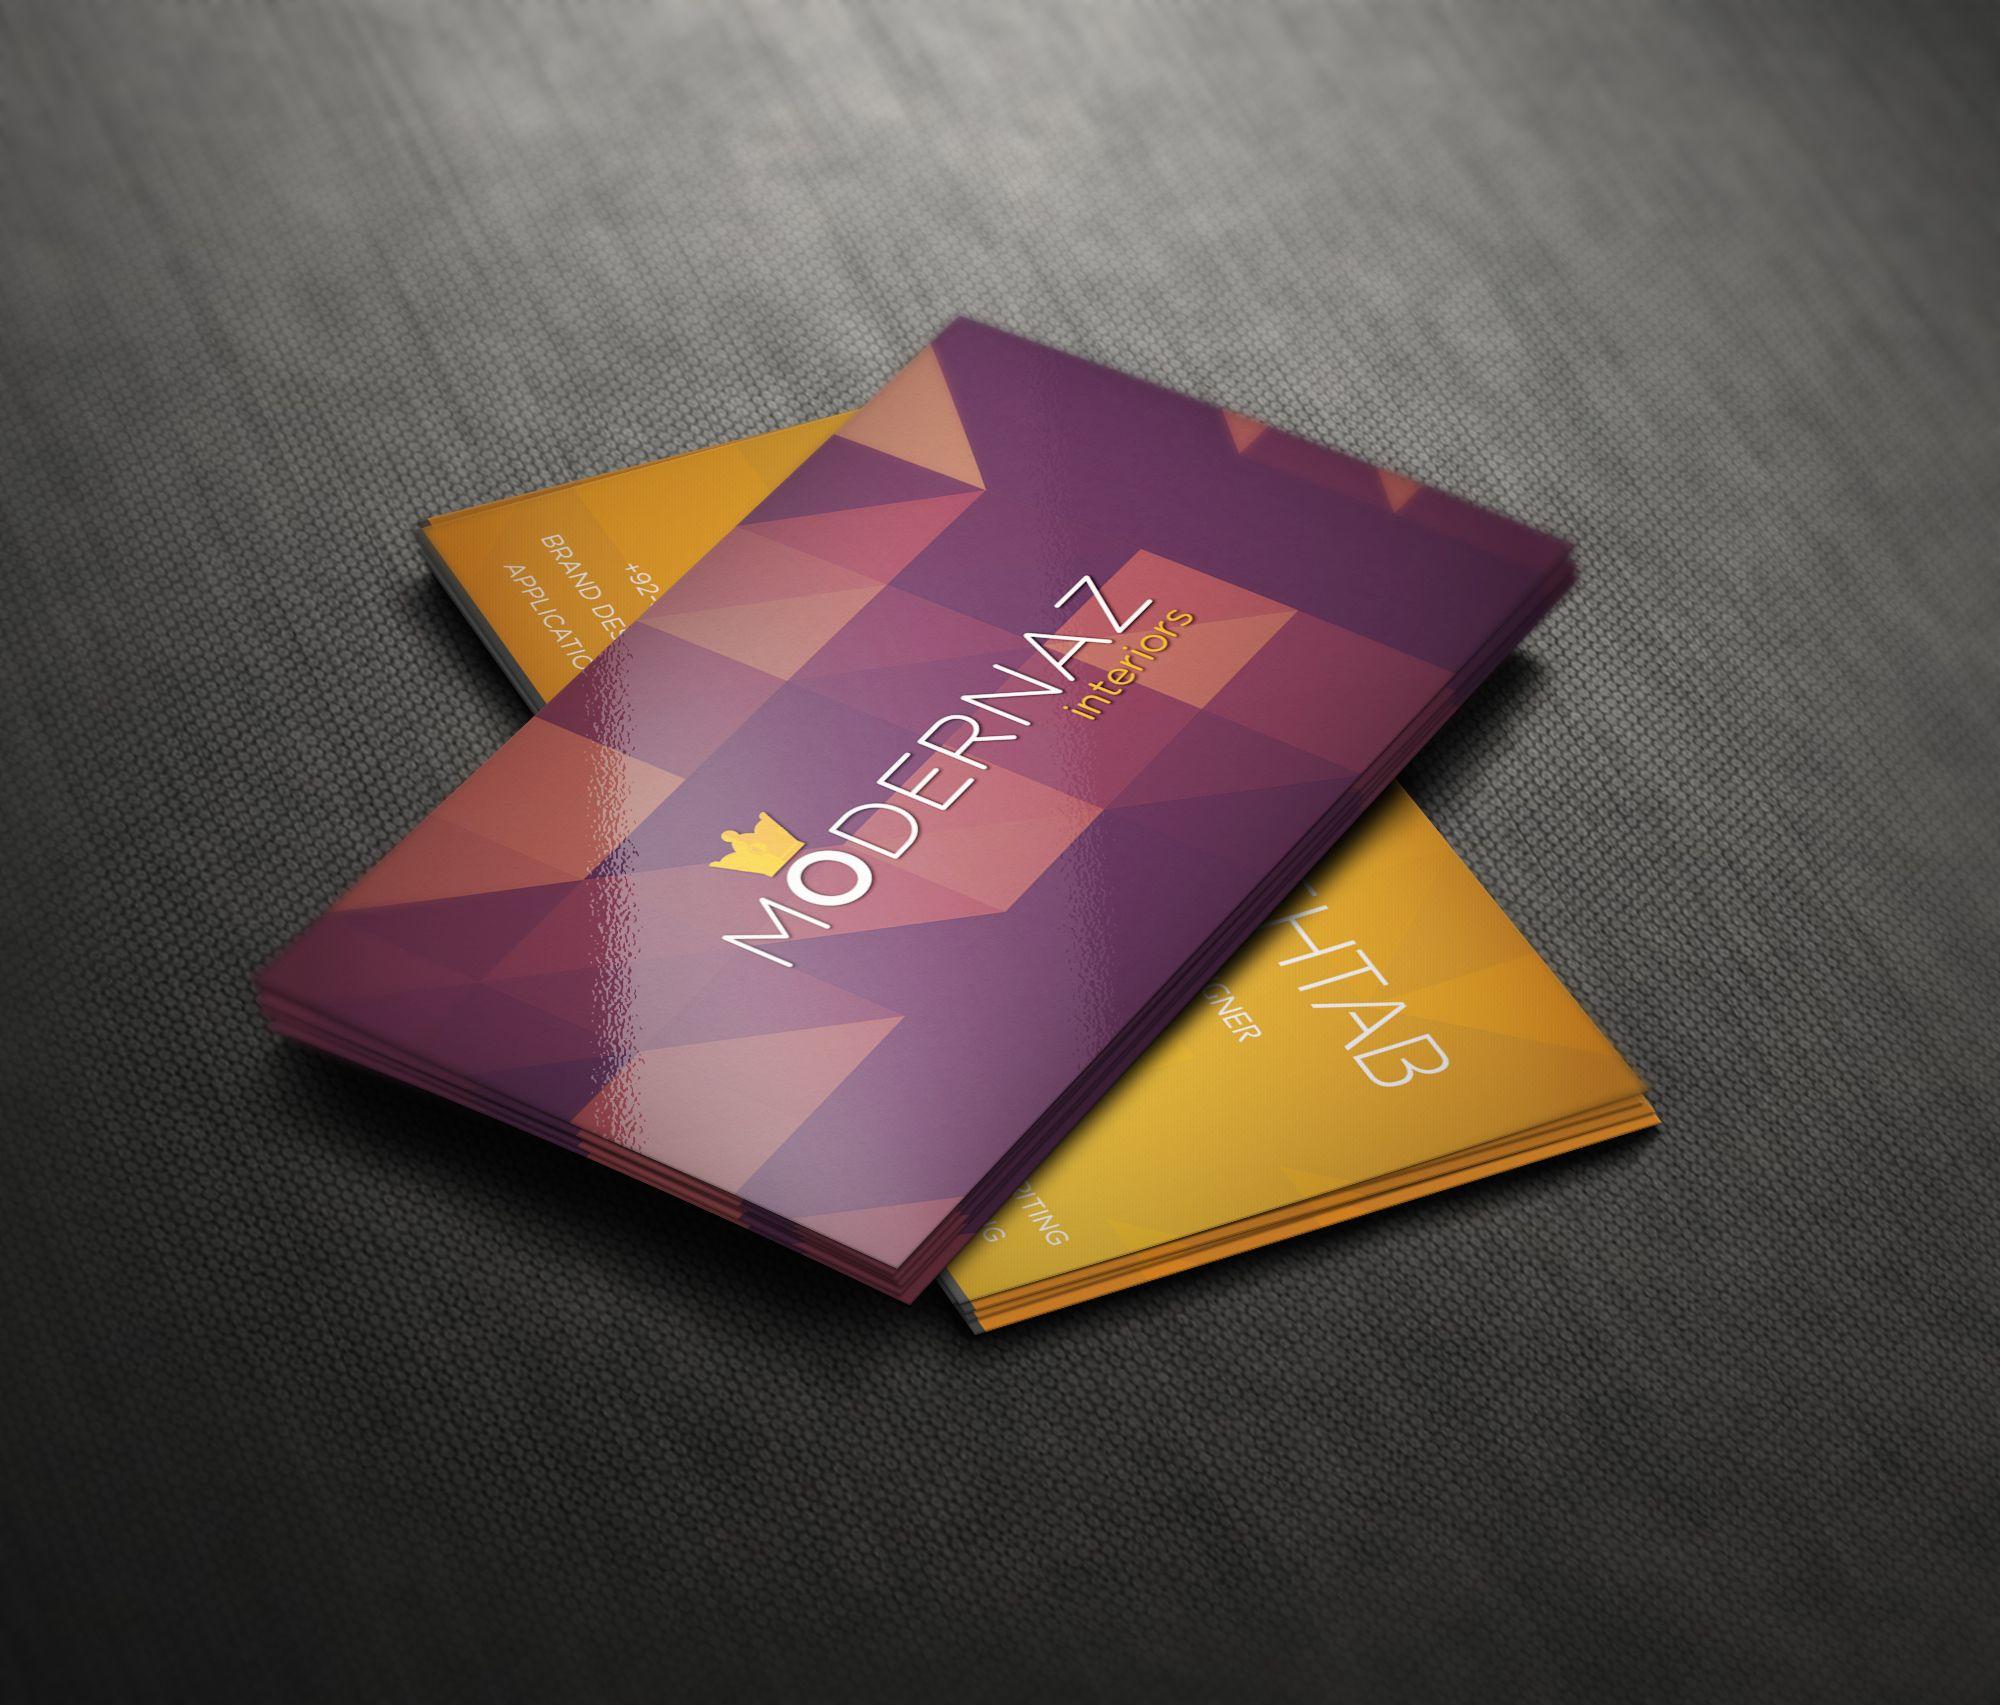 Premium Quality Business Card Design PSD for Free | Business cards ...